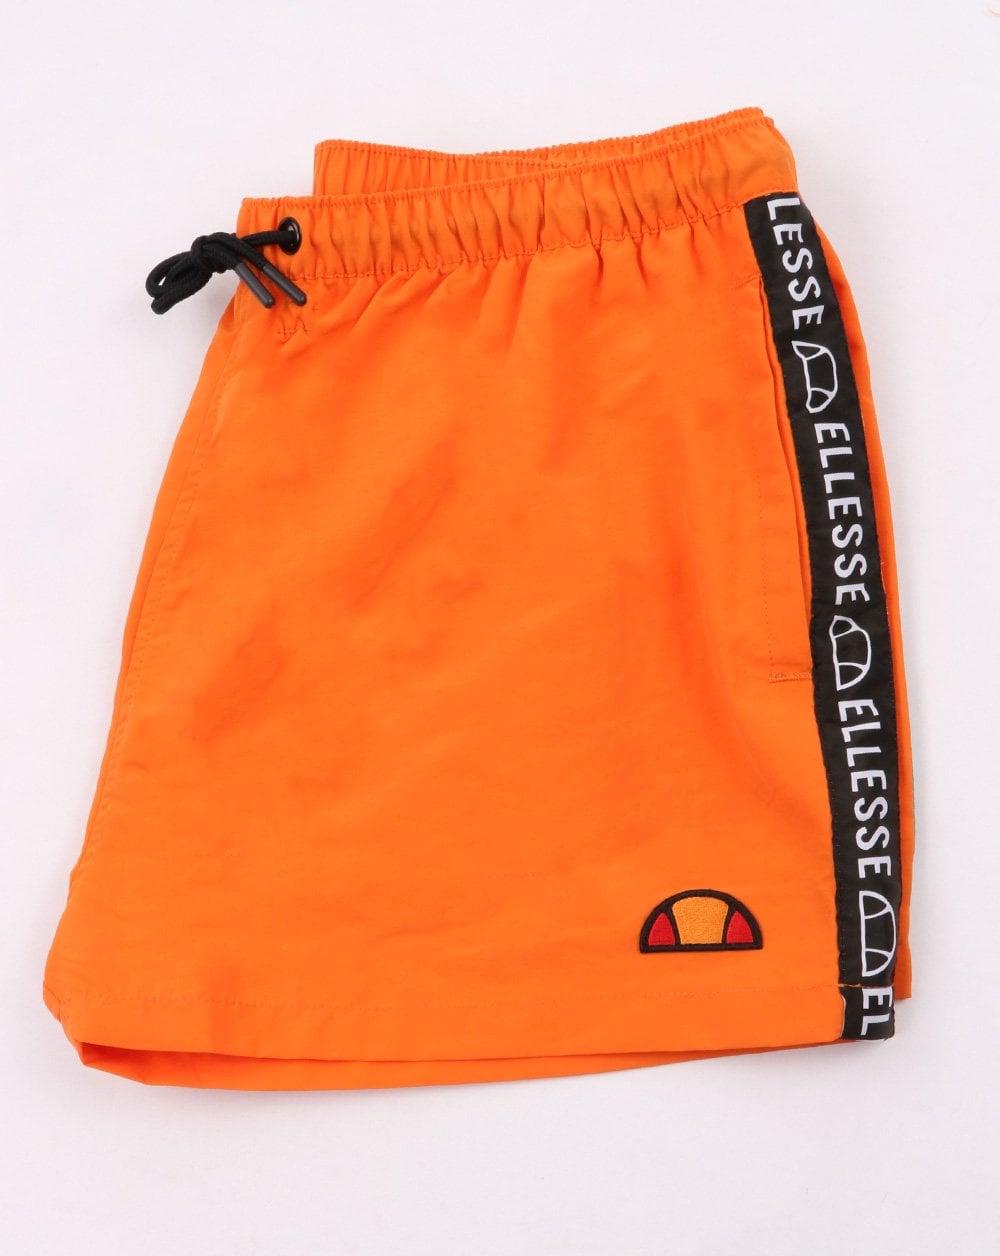 Ellesse Idice Swim Shorts in Orange swimmers beach shorts